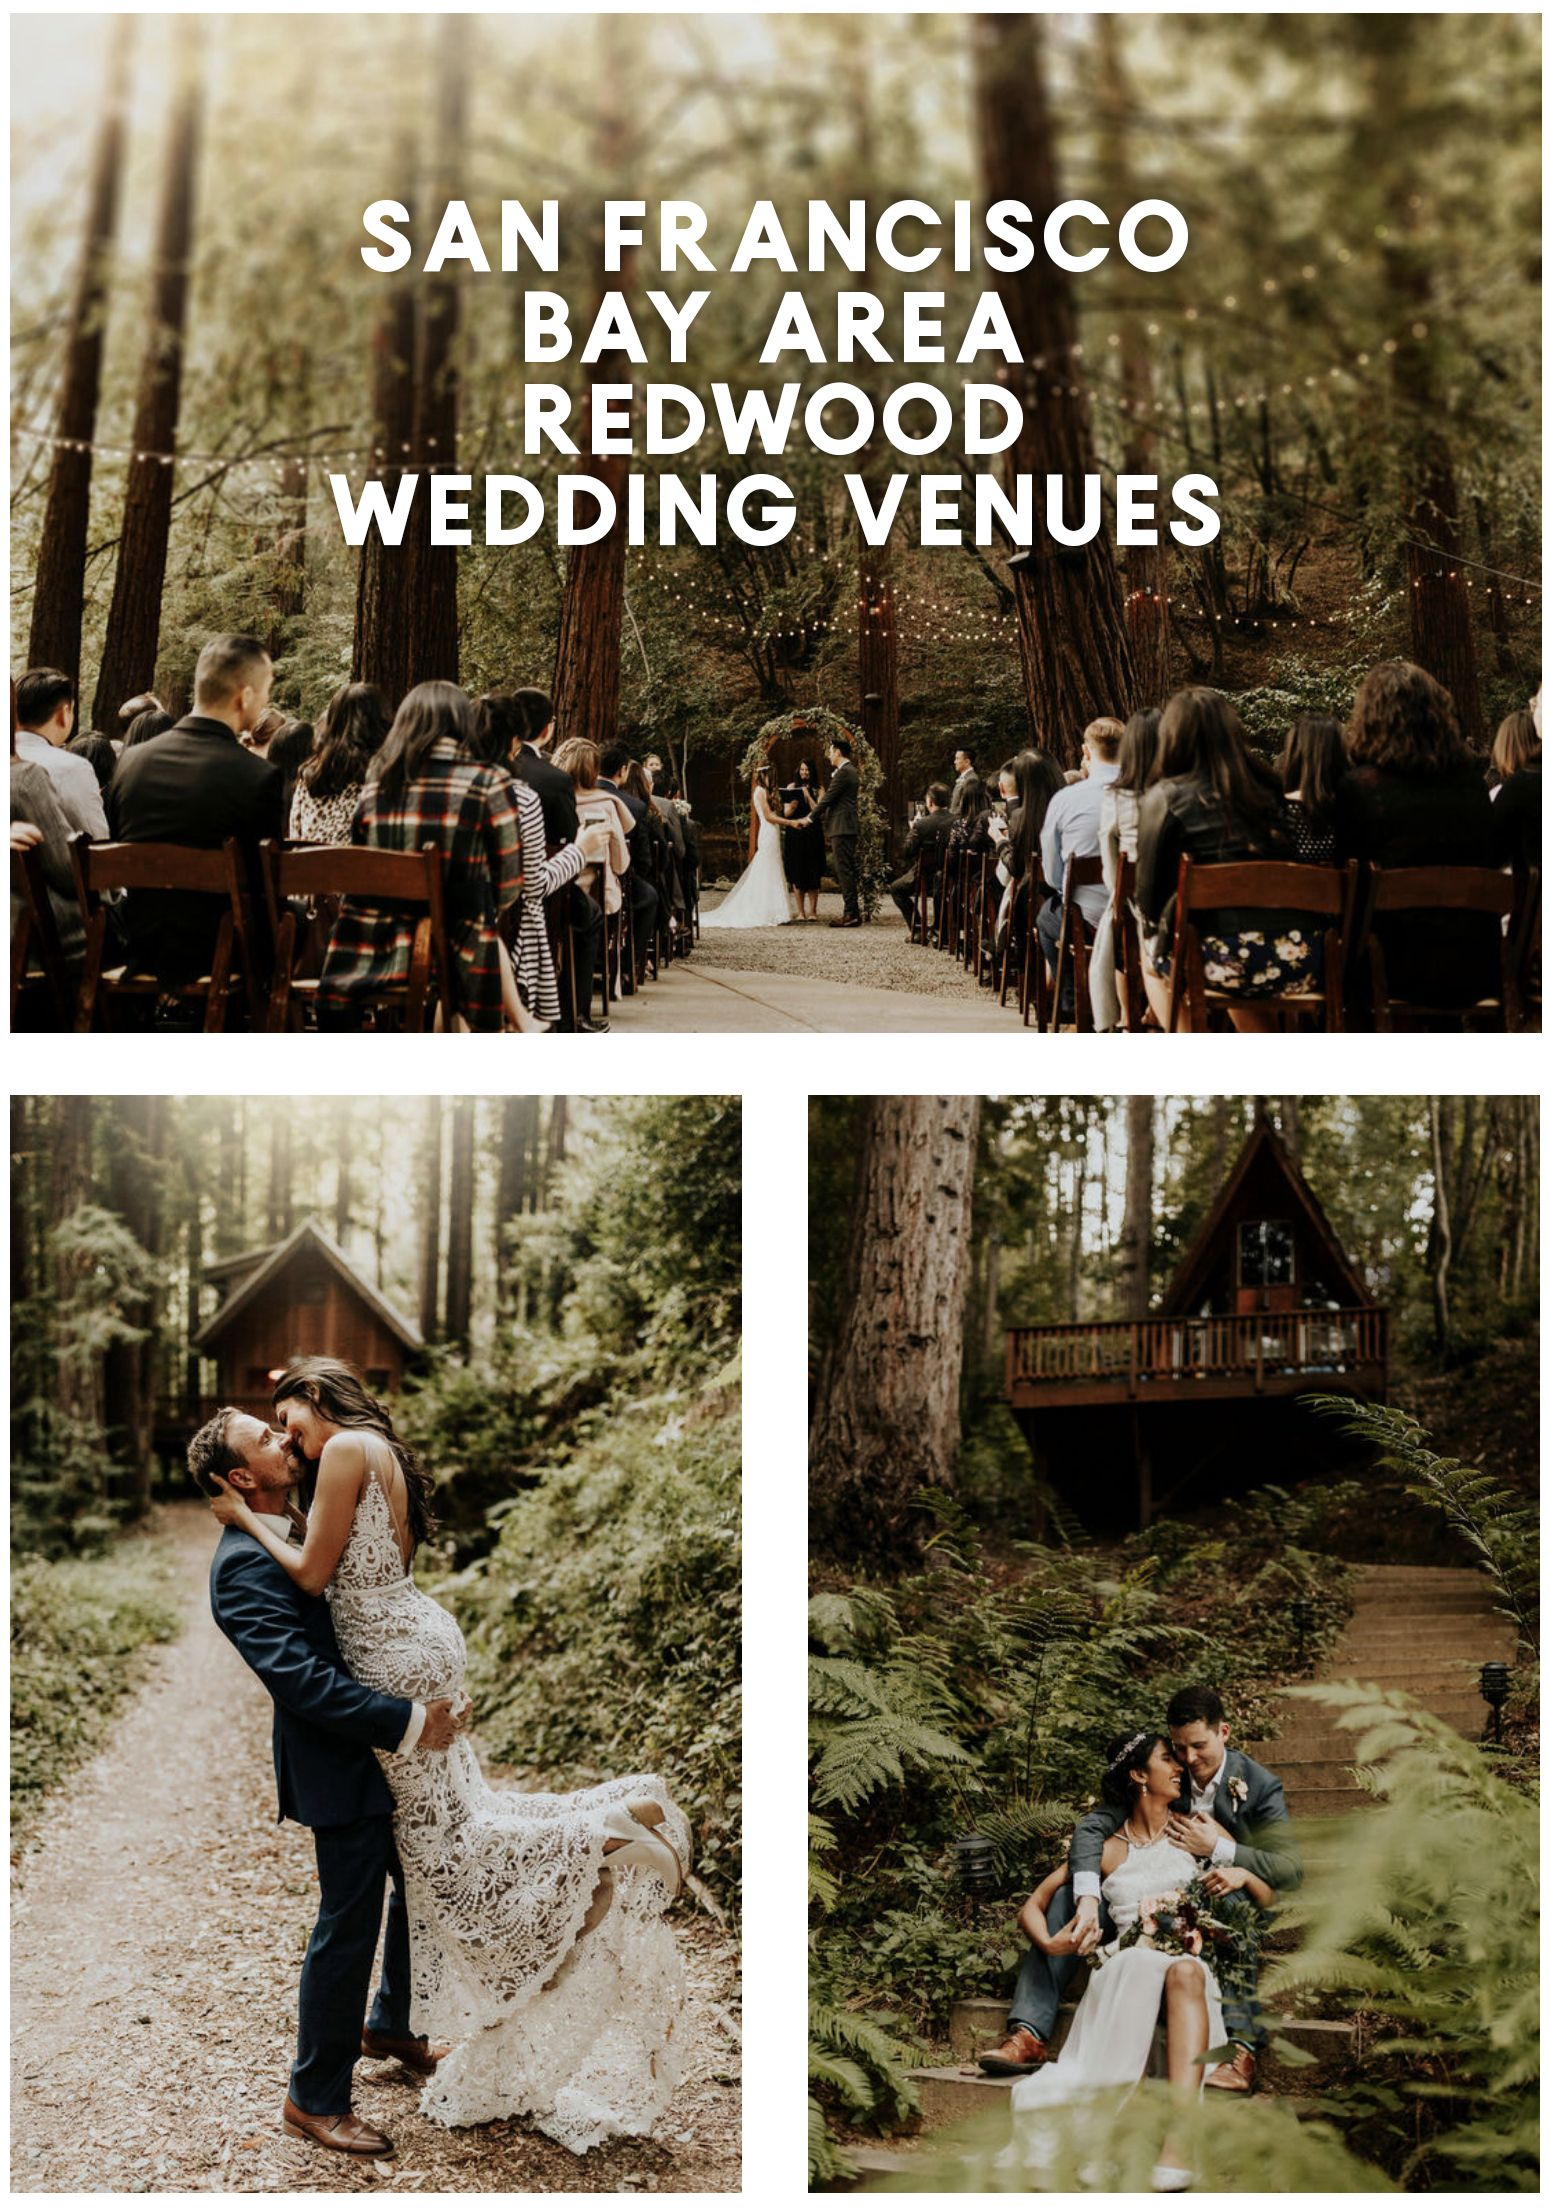 San Francisco Bay Area California Redwood Wedding Venues In 2020 Redwood Wedding Redwood Wedding Venue Outdoor Wedding Venues California